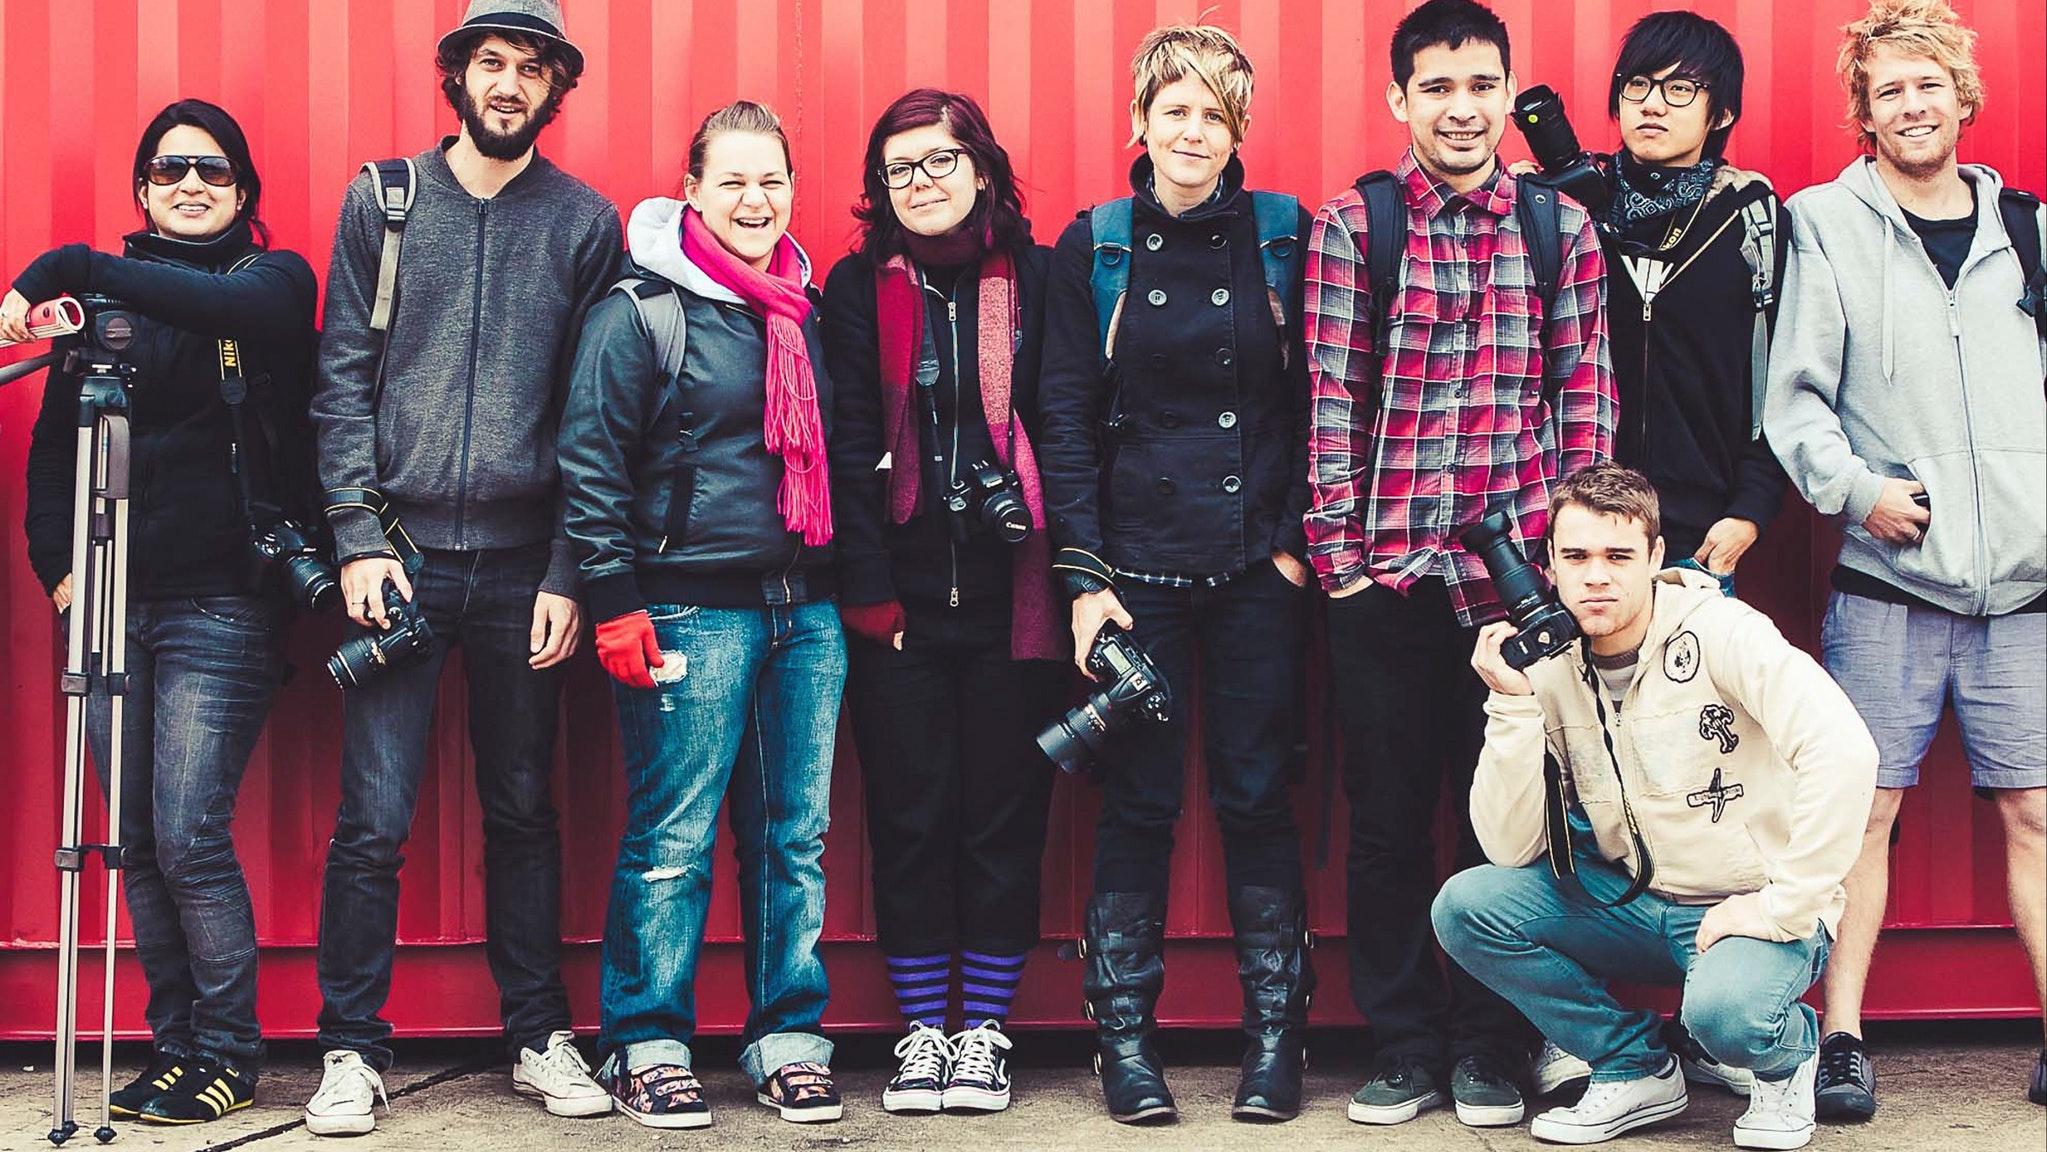 Melbourne Photography Tours